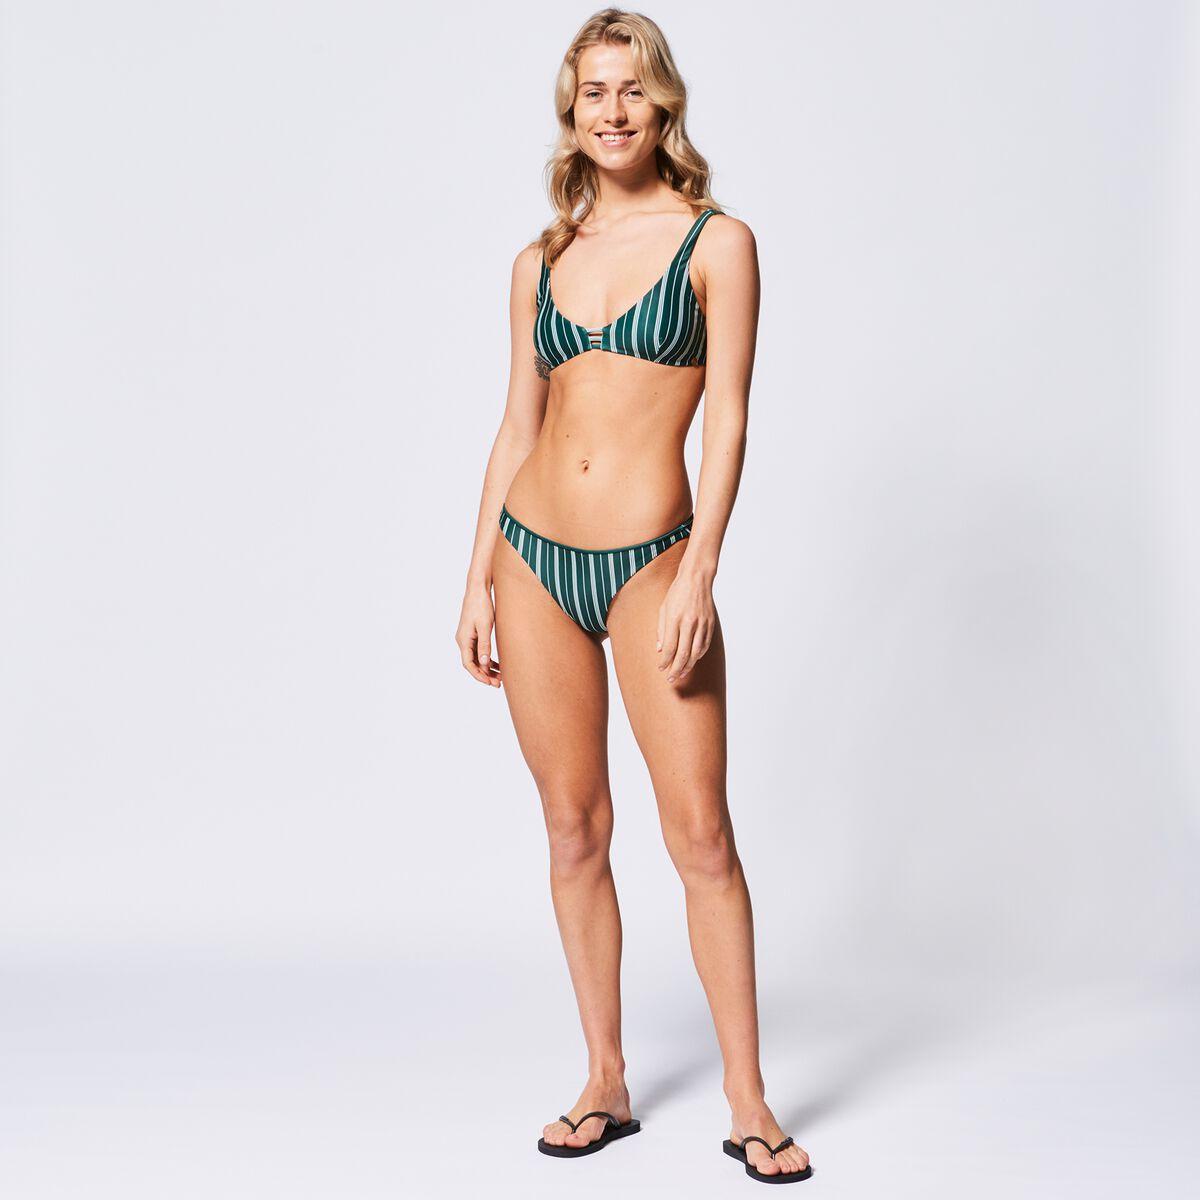 Miss aloha muscle bikini contest